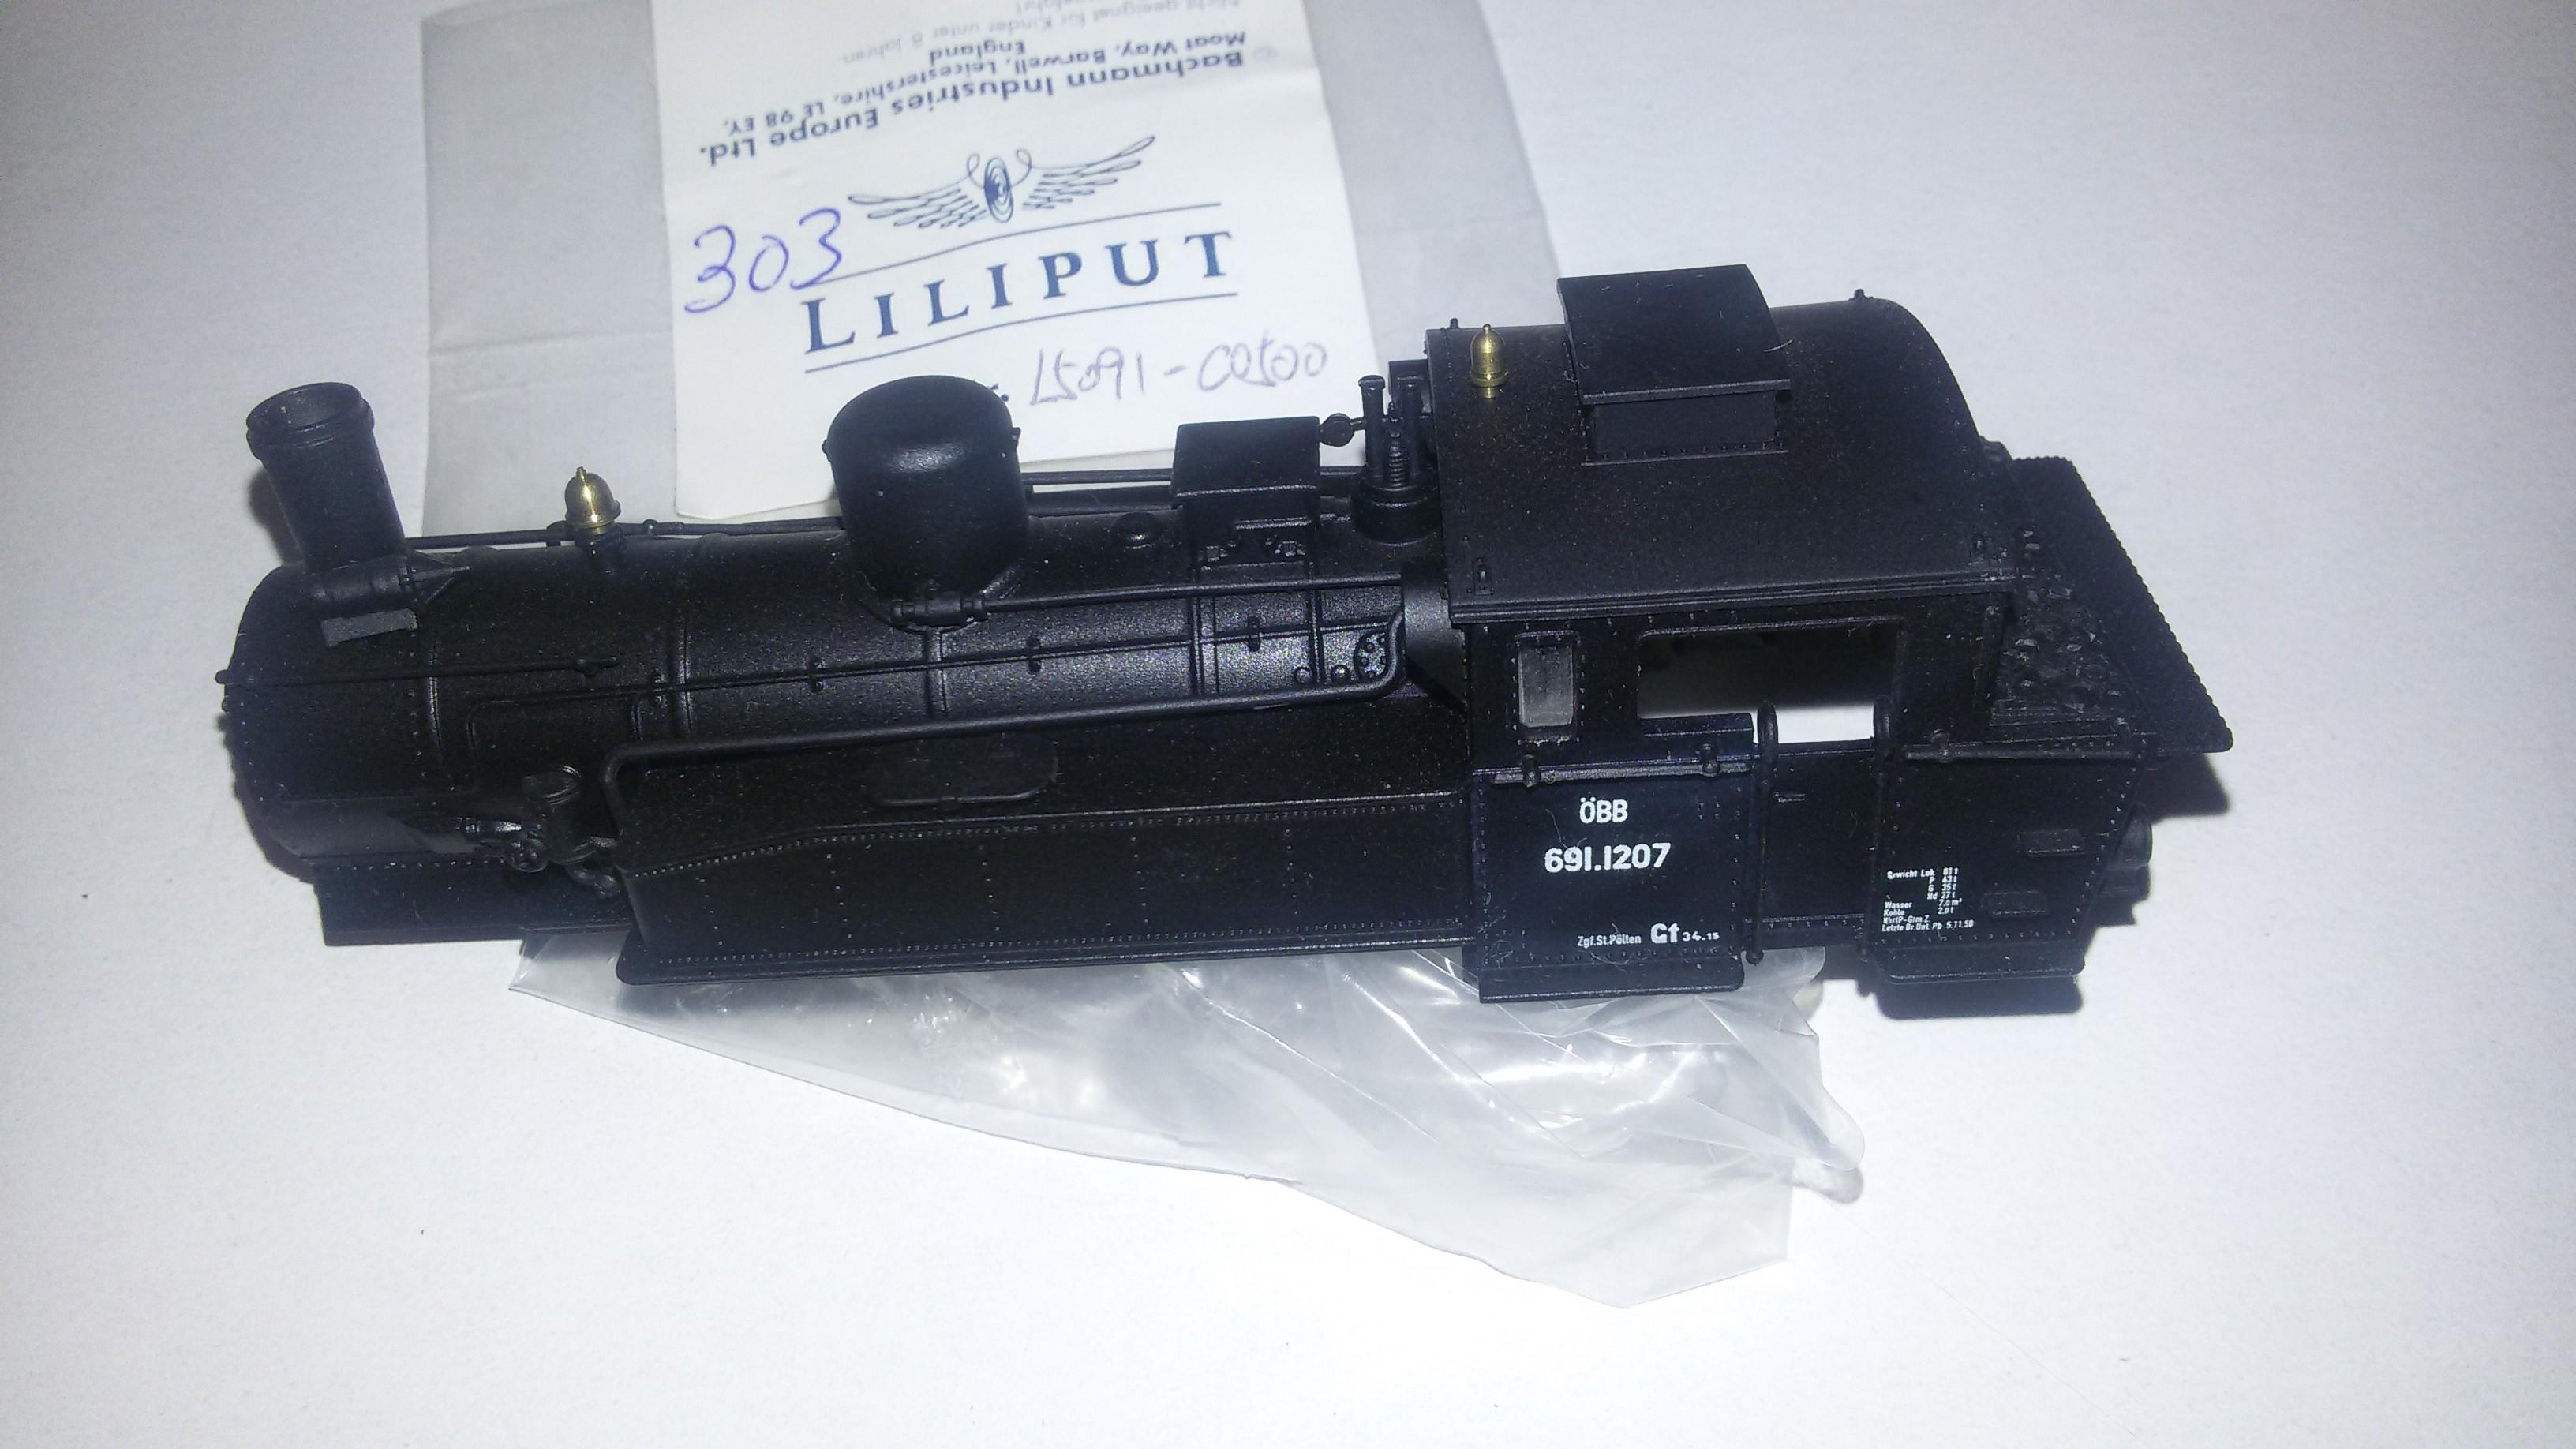 *LO 303* Liliput Ersatzteil L50910500 Lokgehäuse ÖBB 691.1027